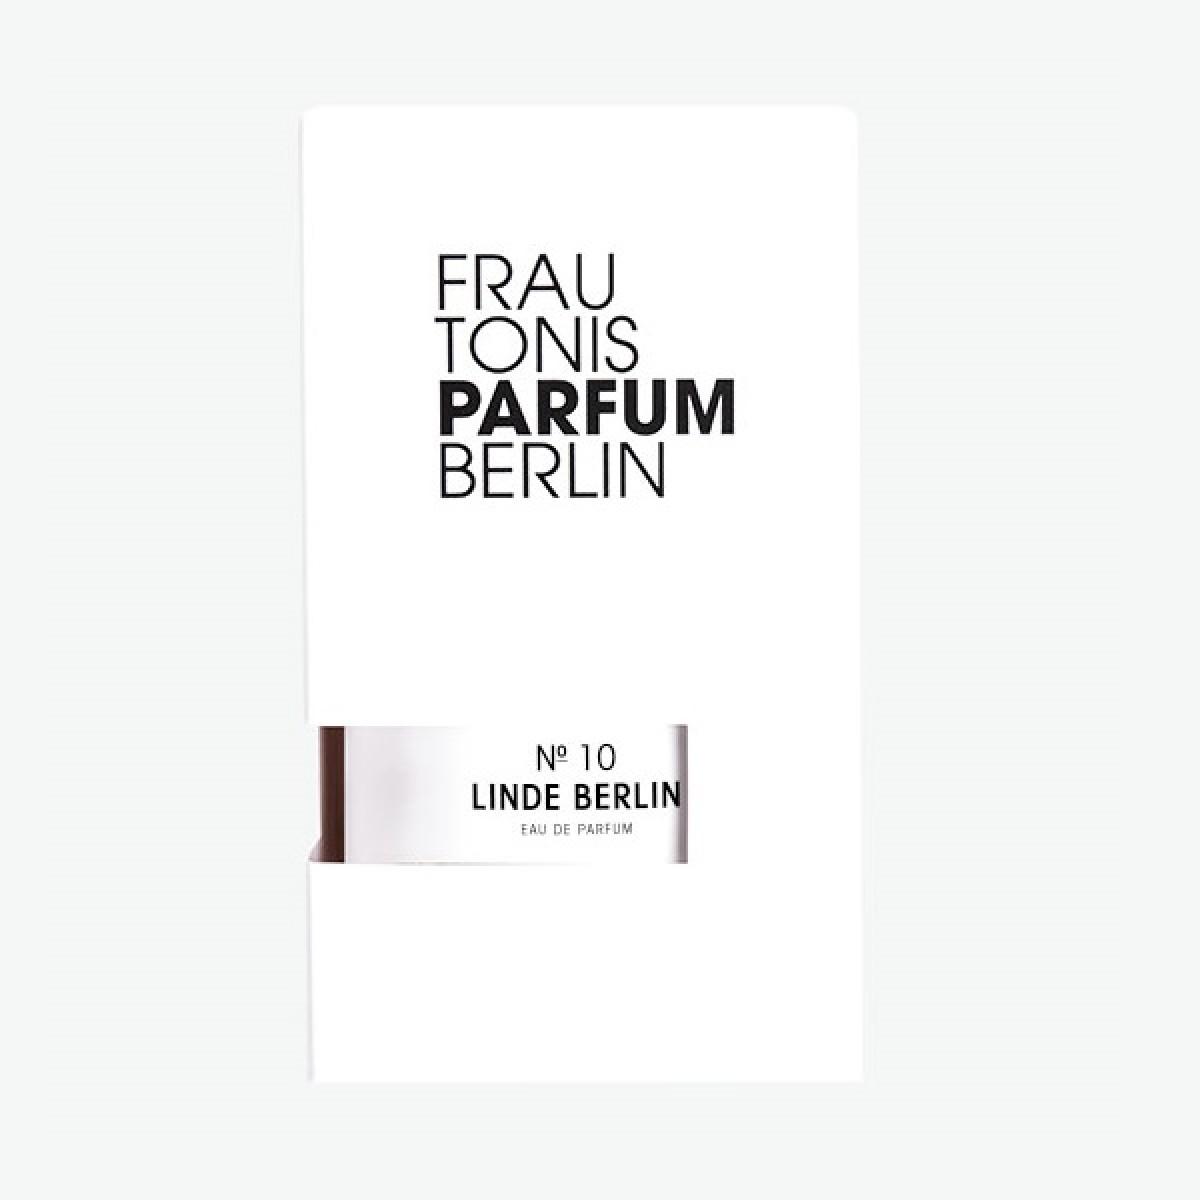 Frau Tonis Parfum No.10 LINDE BERLIN (frisch, blumig, sonnig), 50 ml Eau de Parfum